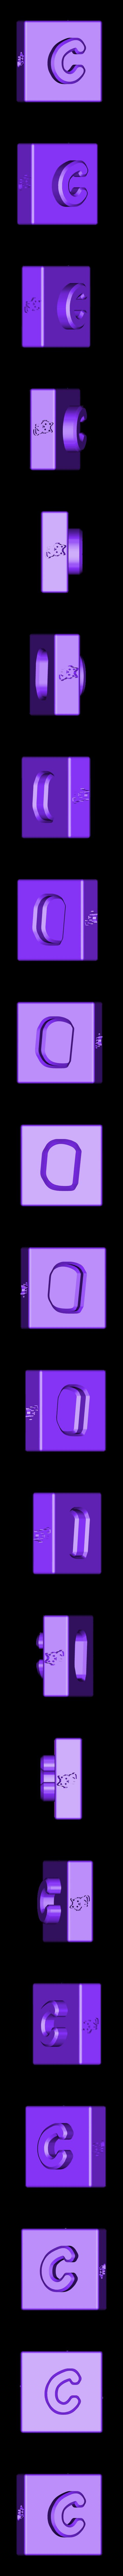 C.stl Download free STL file Mental blocks • Object to 3D print, RevK